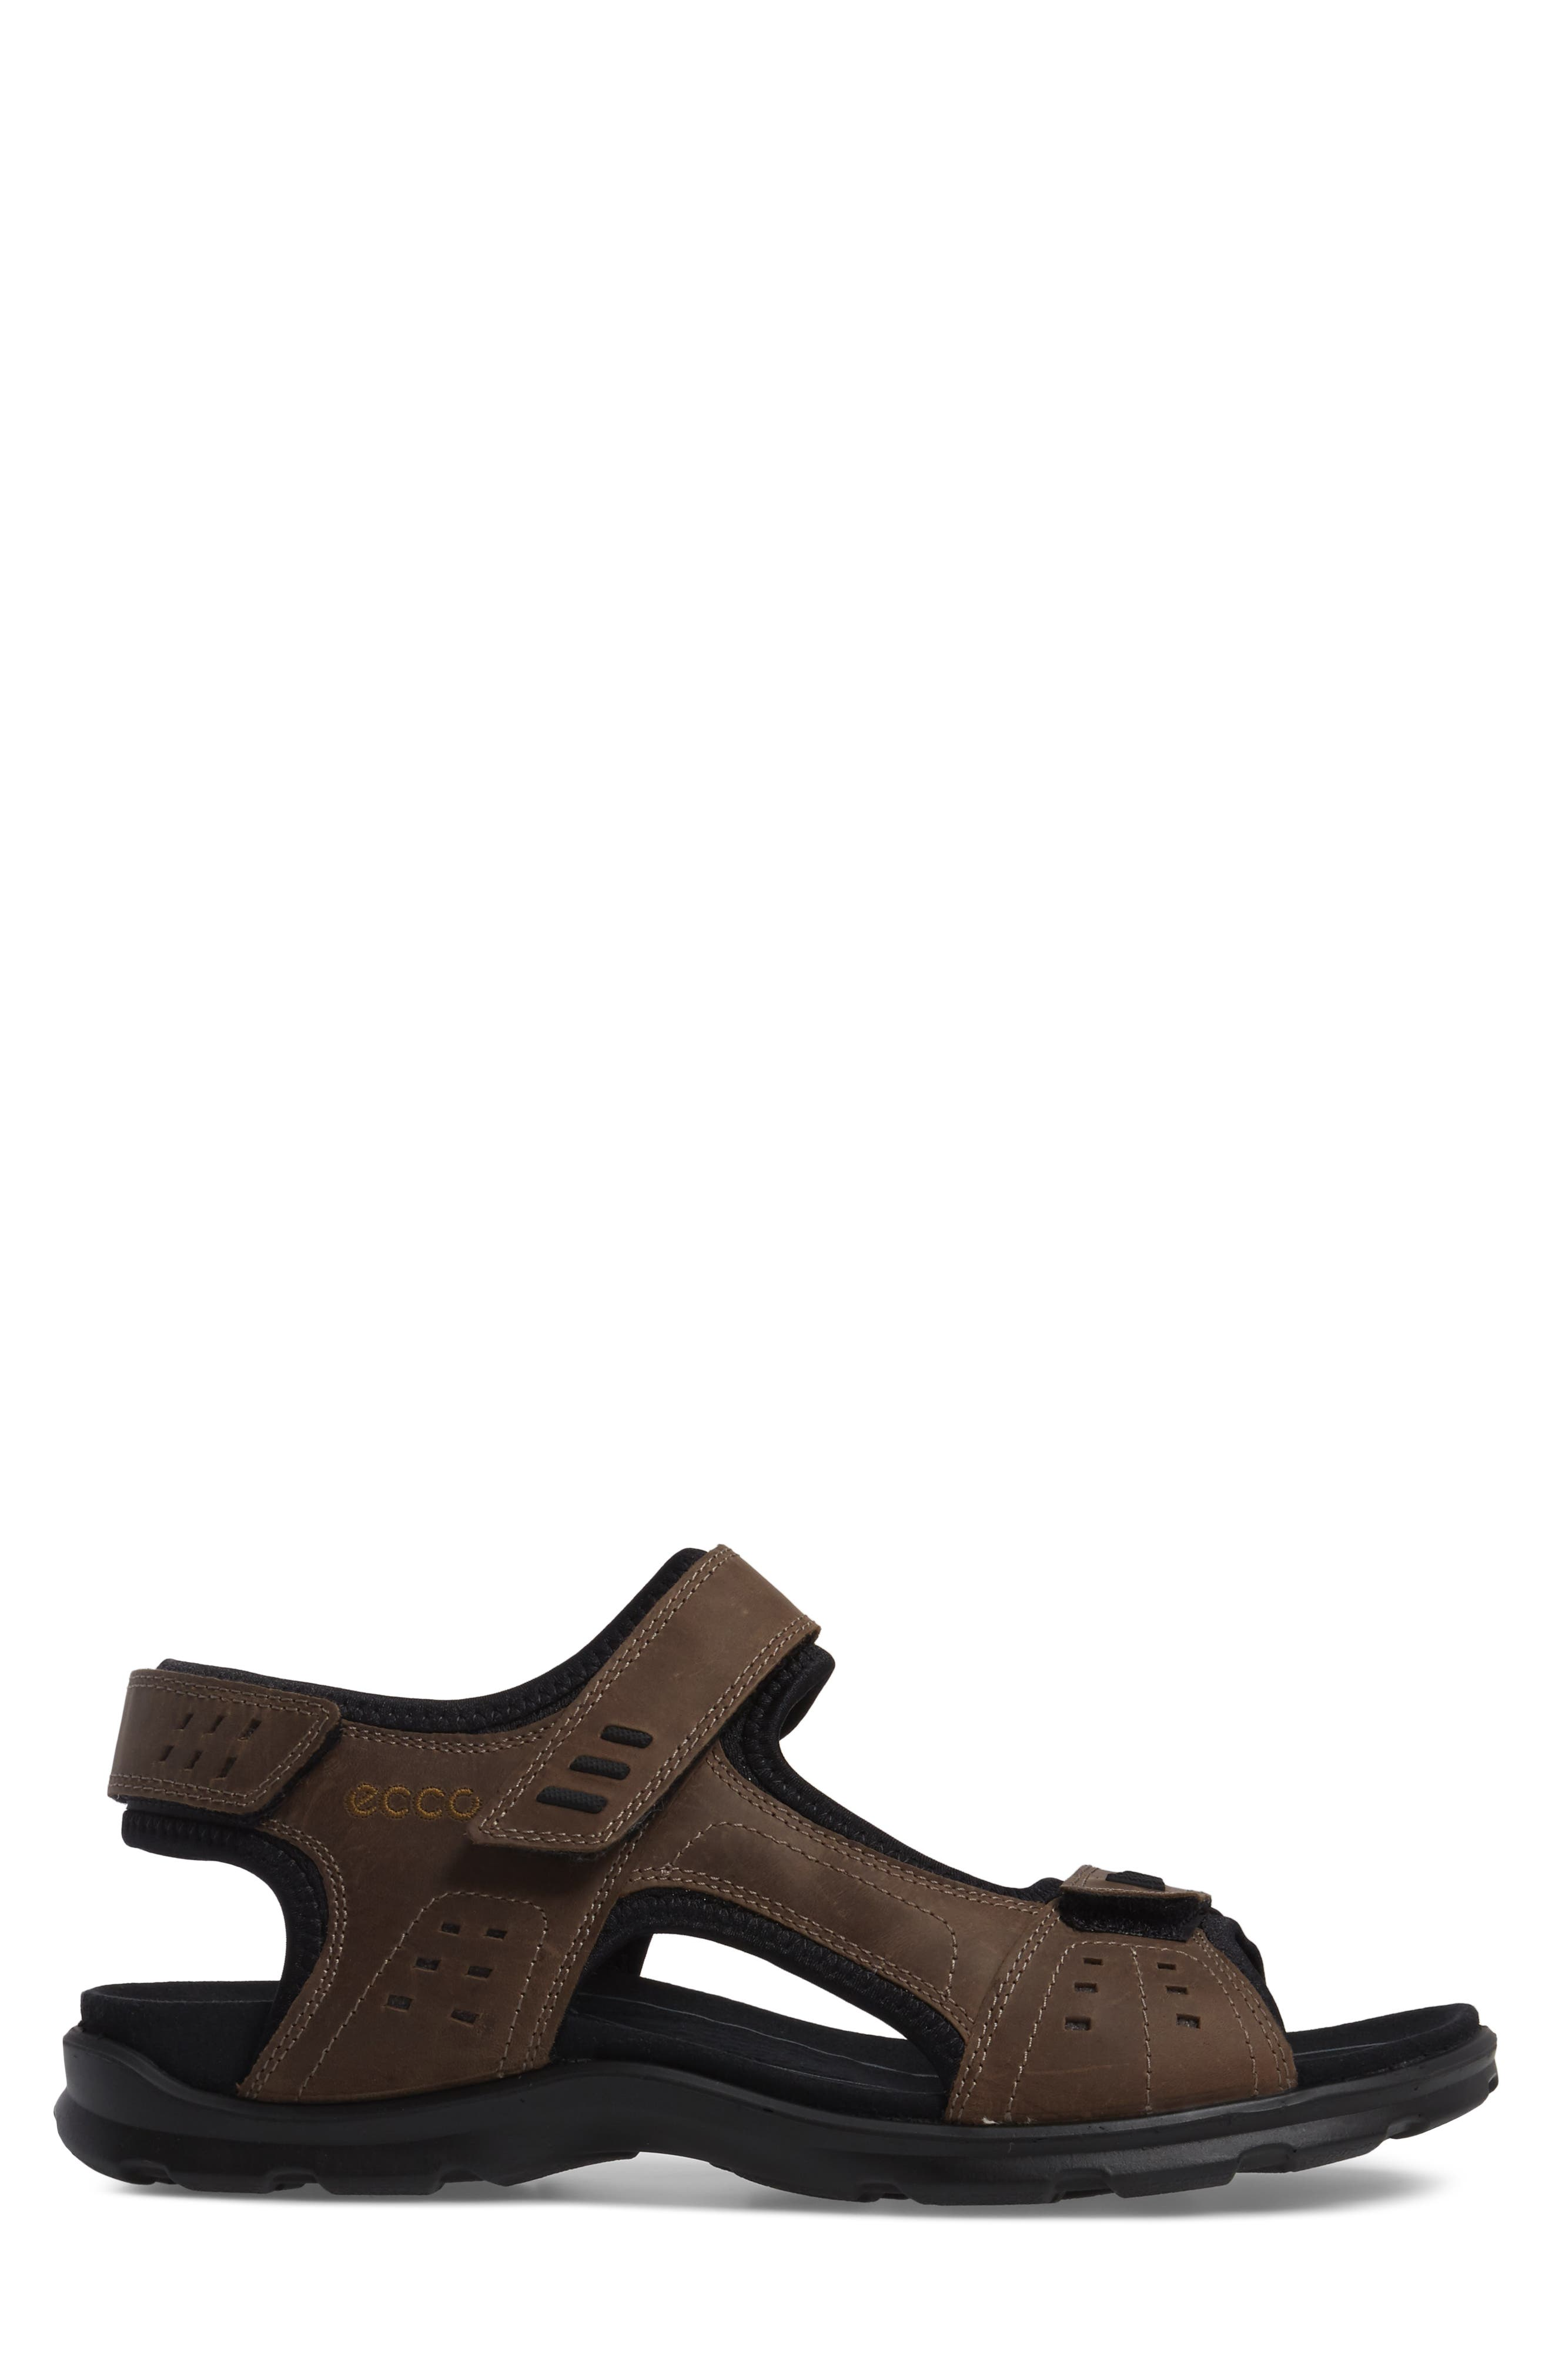 Utah Sandal,                             Alternate thumbnail 3, color,                             217